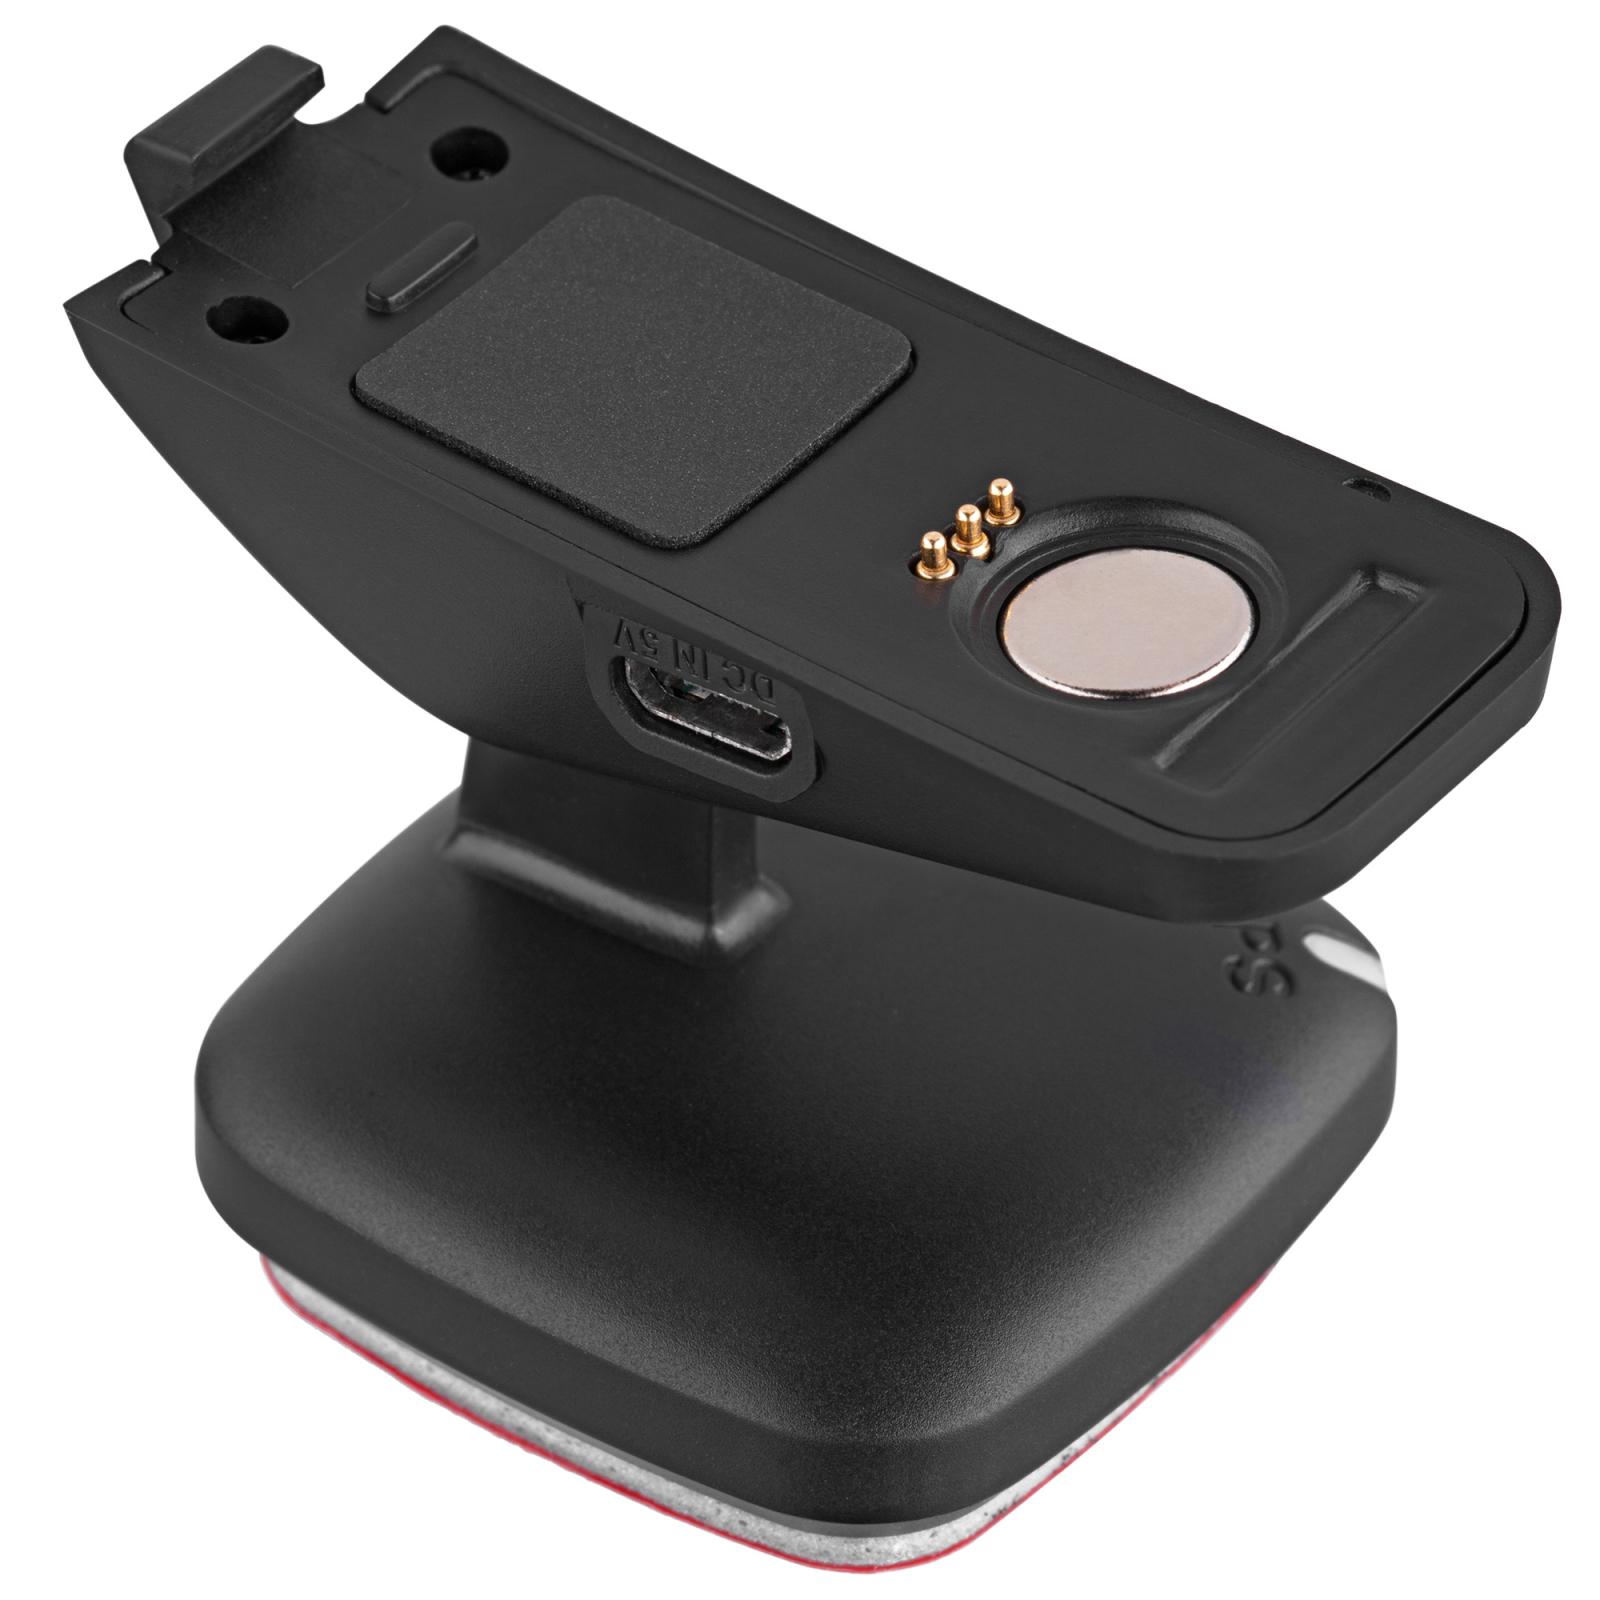 Відеореєстратор 2E Drive 550 Magnet (2E-DRIVE550MAGNET) зображення 9